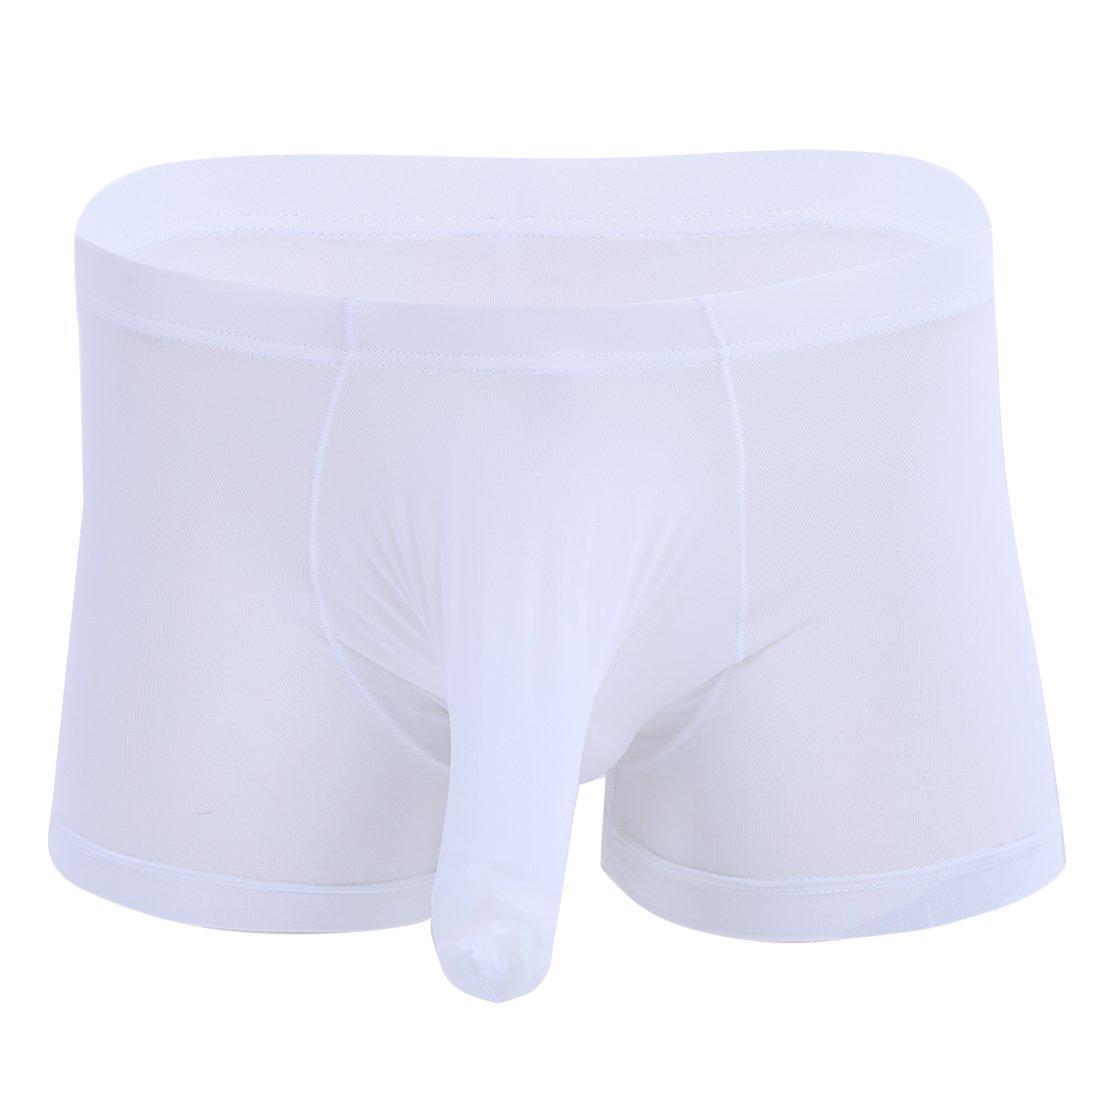 Agoky Men's Silky Boxer Shorts Trunks Underwear Lingerie Long Cock Sheath Bikini Briefs